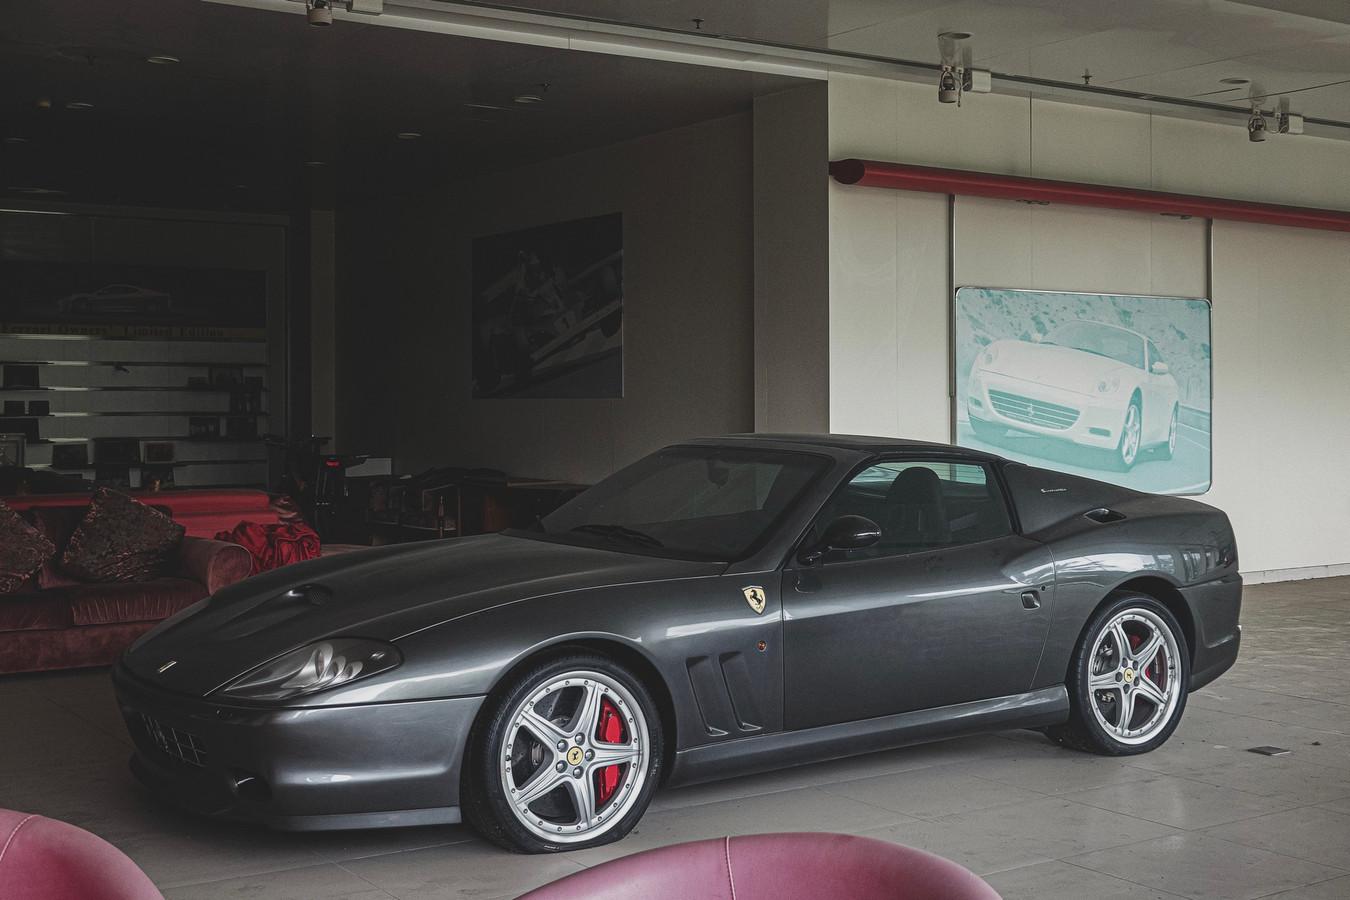 Ferrari 575 Superamerica.